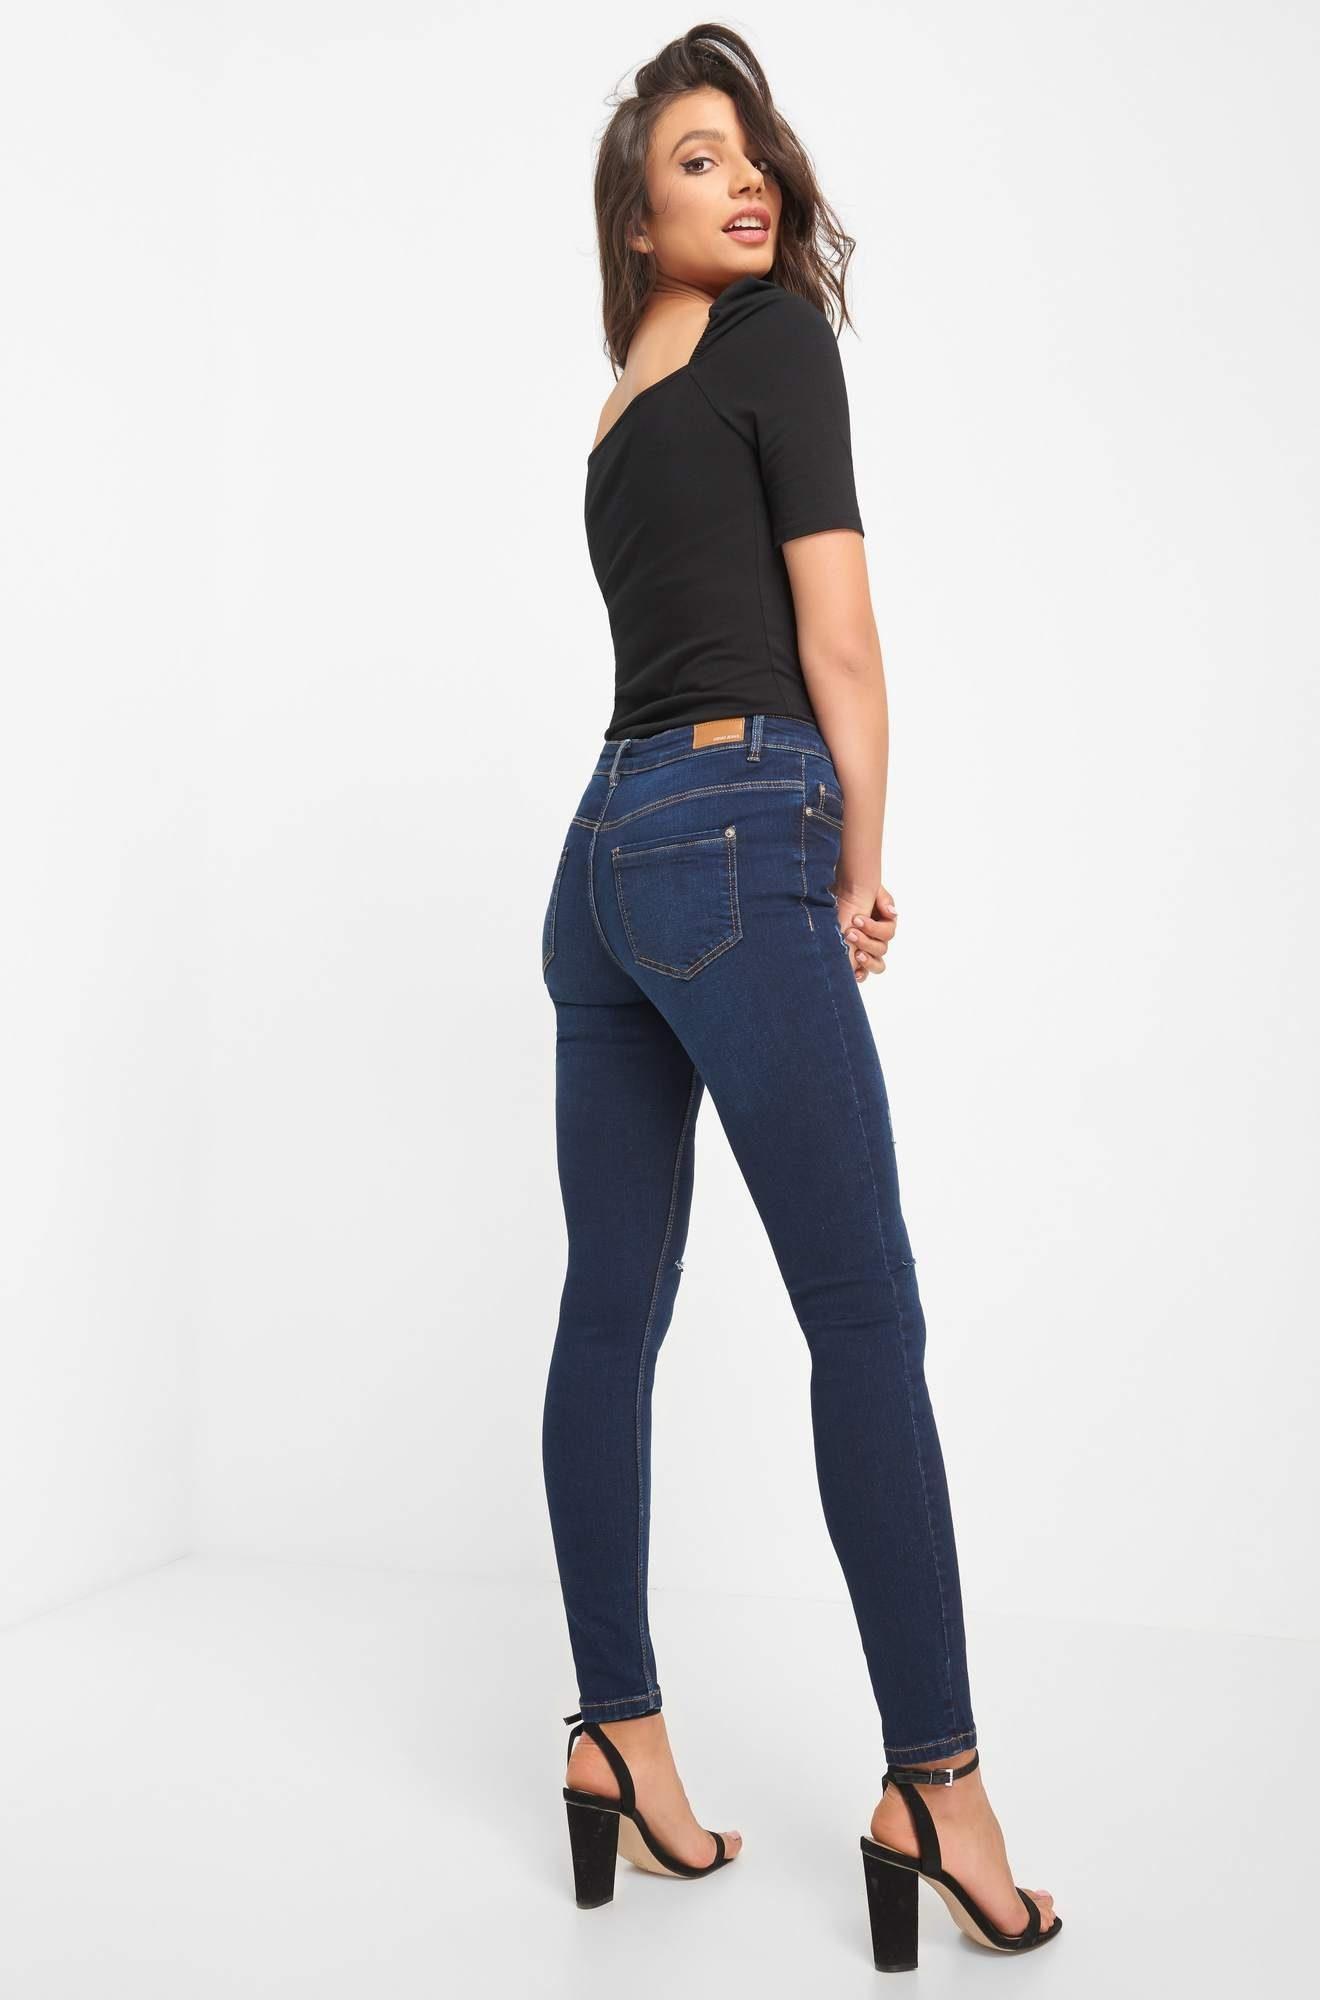 jeans Im look fit Destroyed Skinny Kaufen Orsay iuZTPkOX